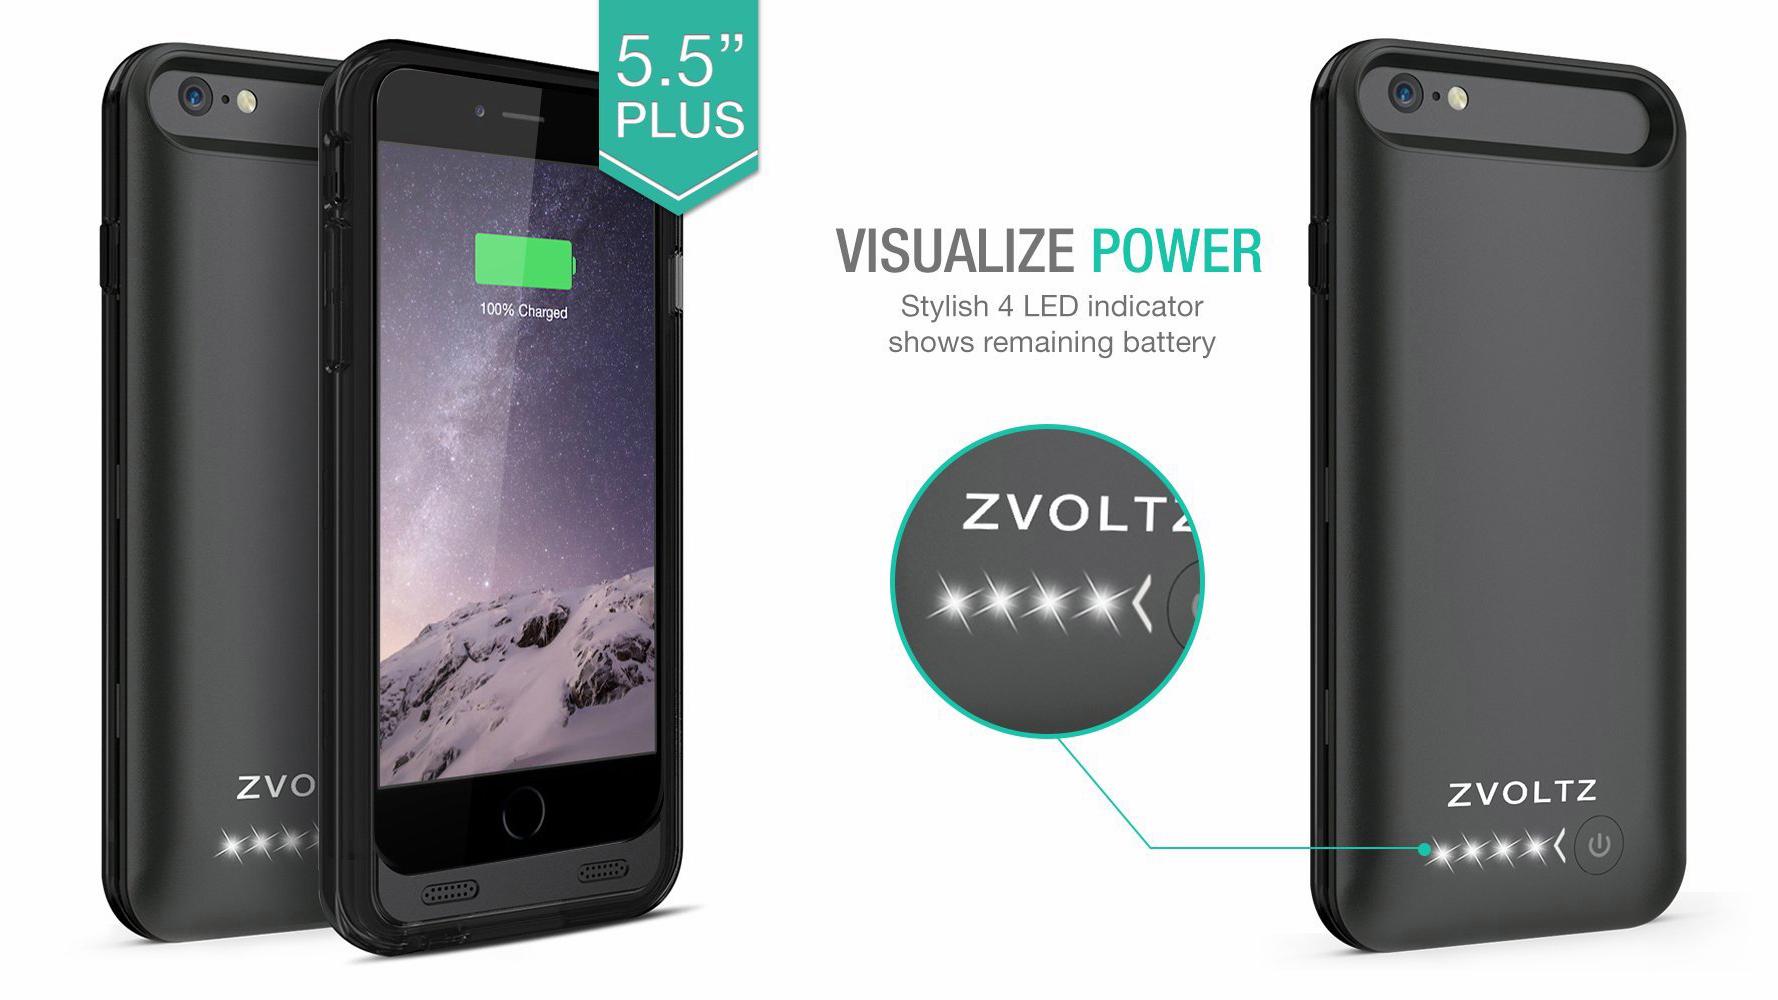 zvoltz-iphone-6-plus-battery-case-deal